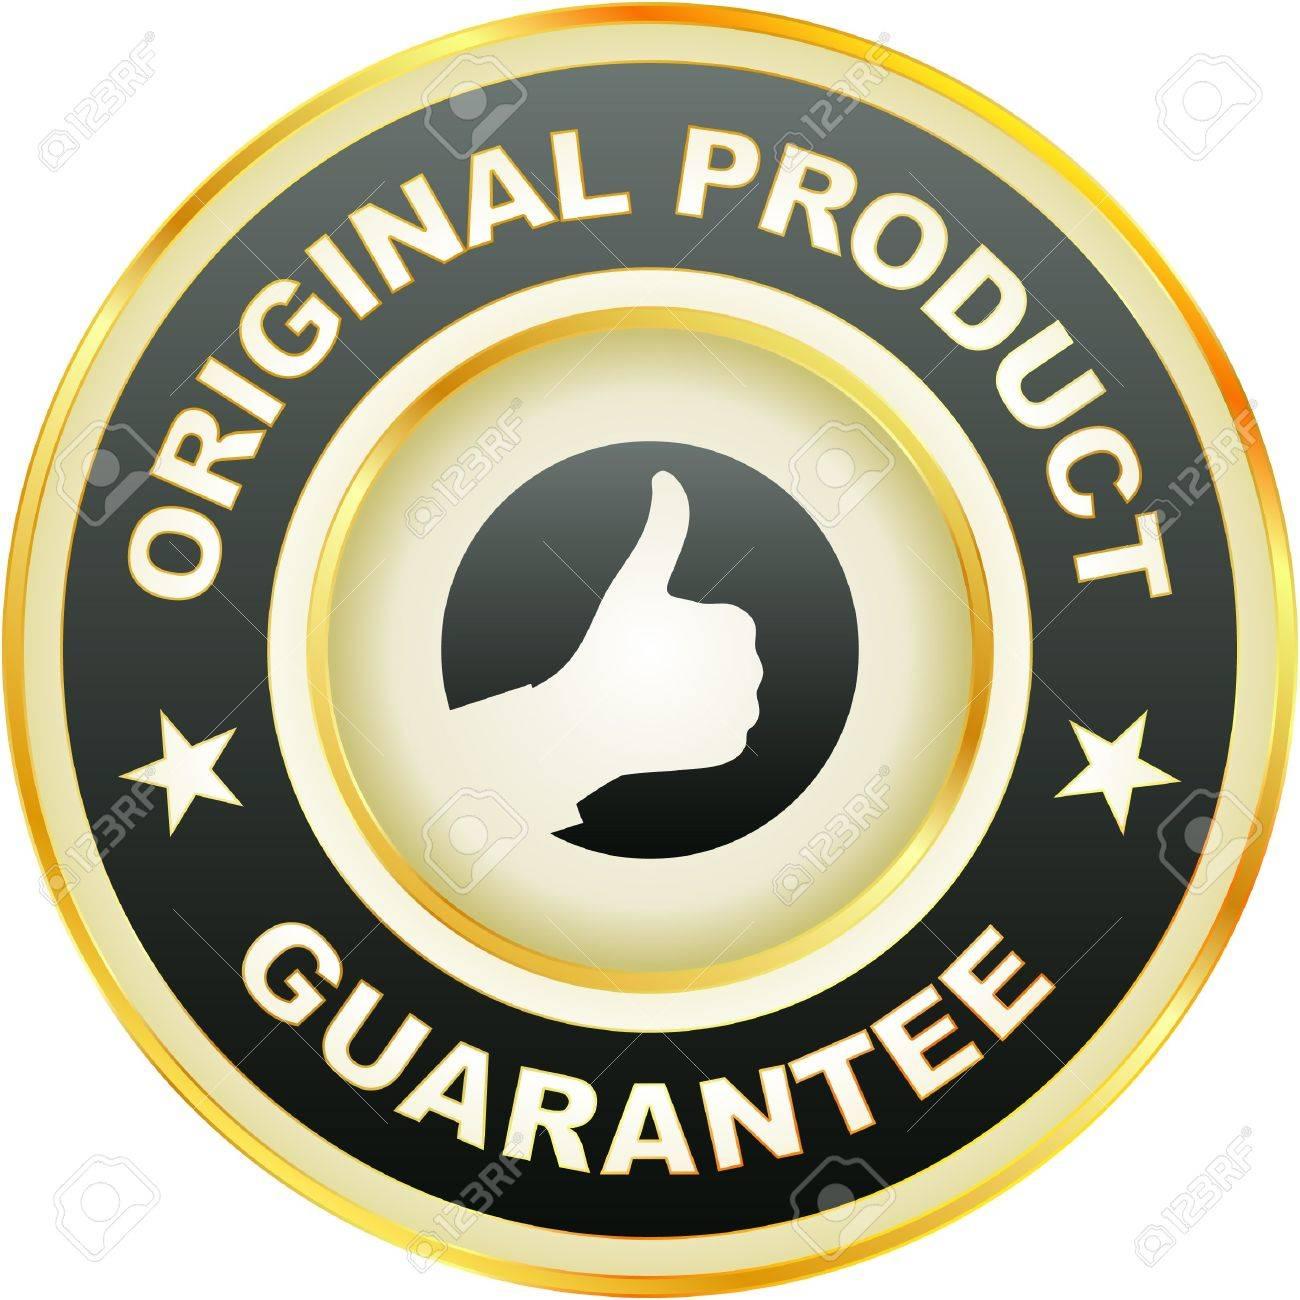 guarantee label. Stock Vector - 7243093